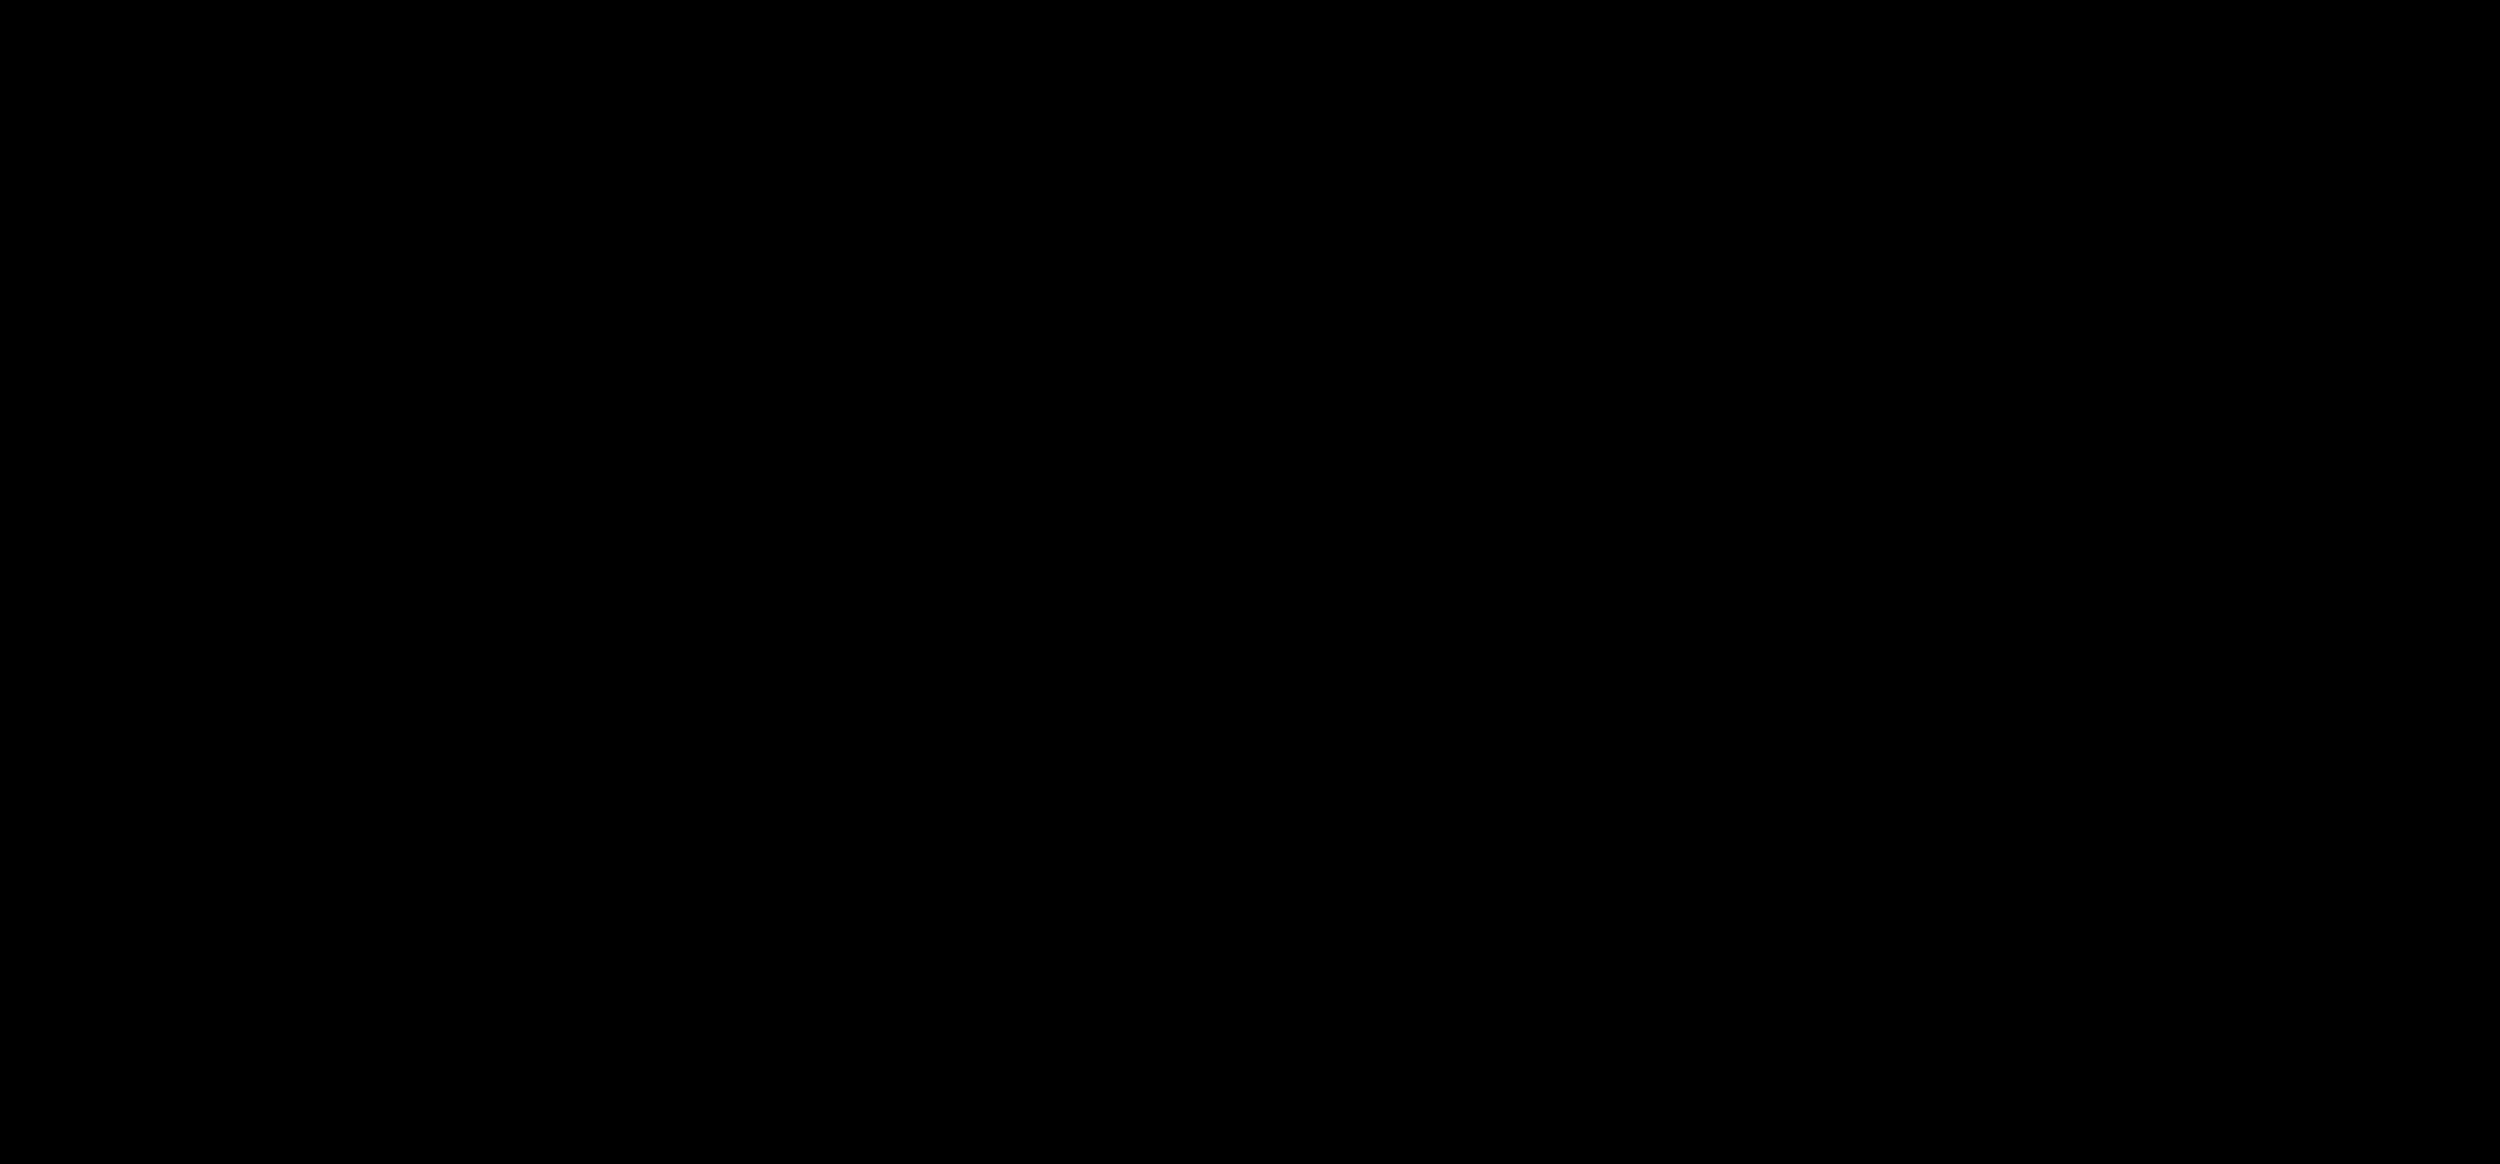 sencillo-logo-black.png